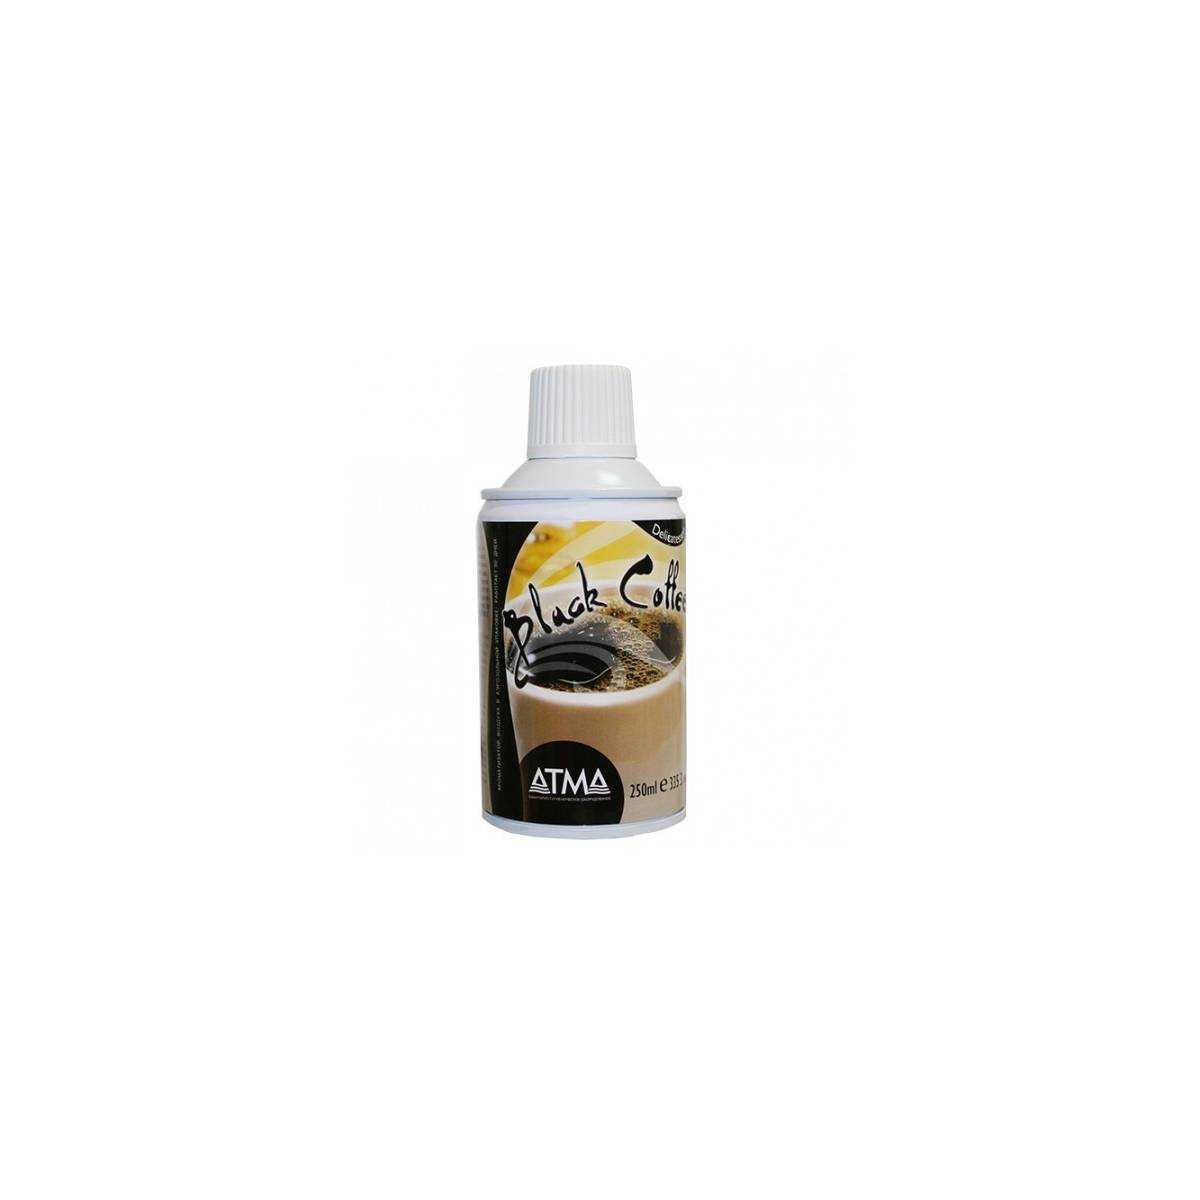 Аэрозольный баллончик 250мл, Греция (Black Coffee) 12-04-0016 Атма